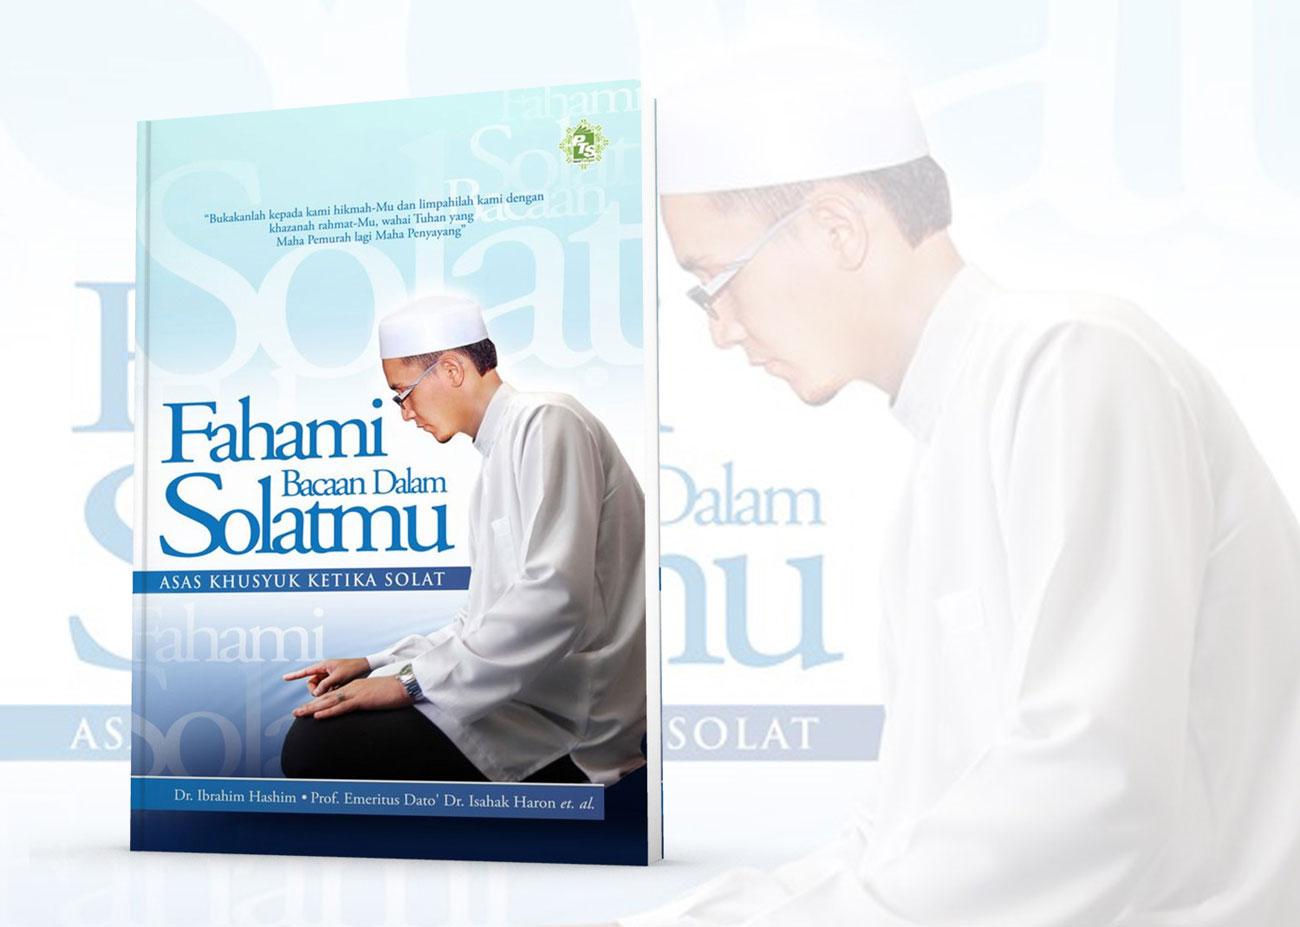 Fahami Bacaan Dalam Solatmu - Ibrahim bin Hashim, Profesor Emeritus Dato' Isahak Haron